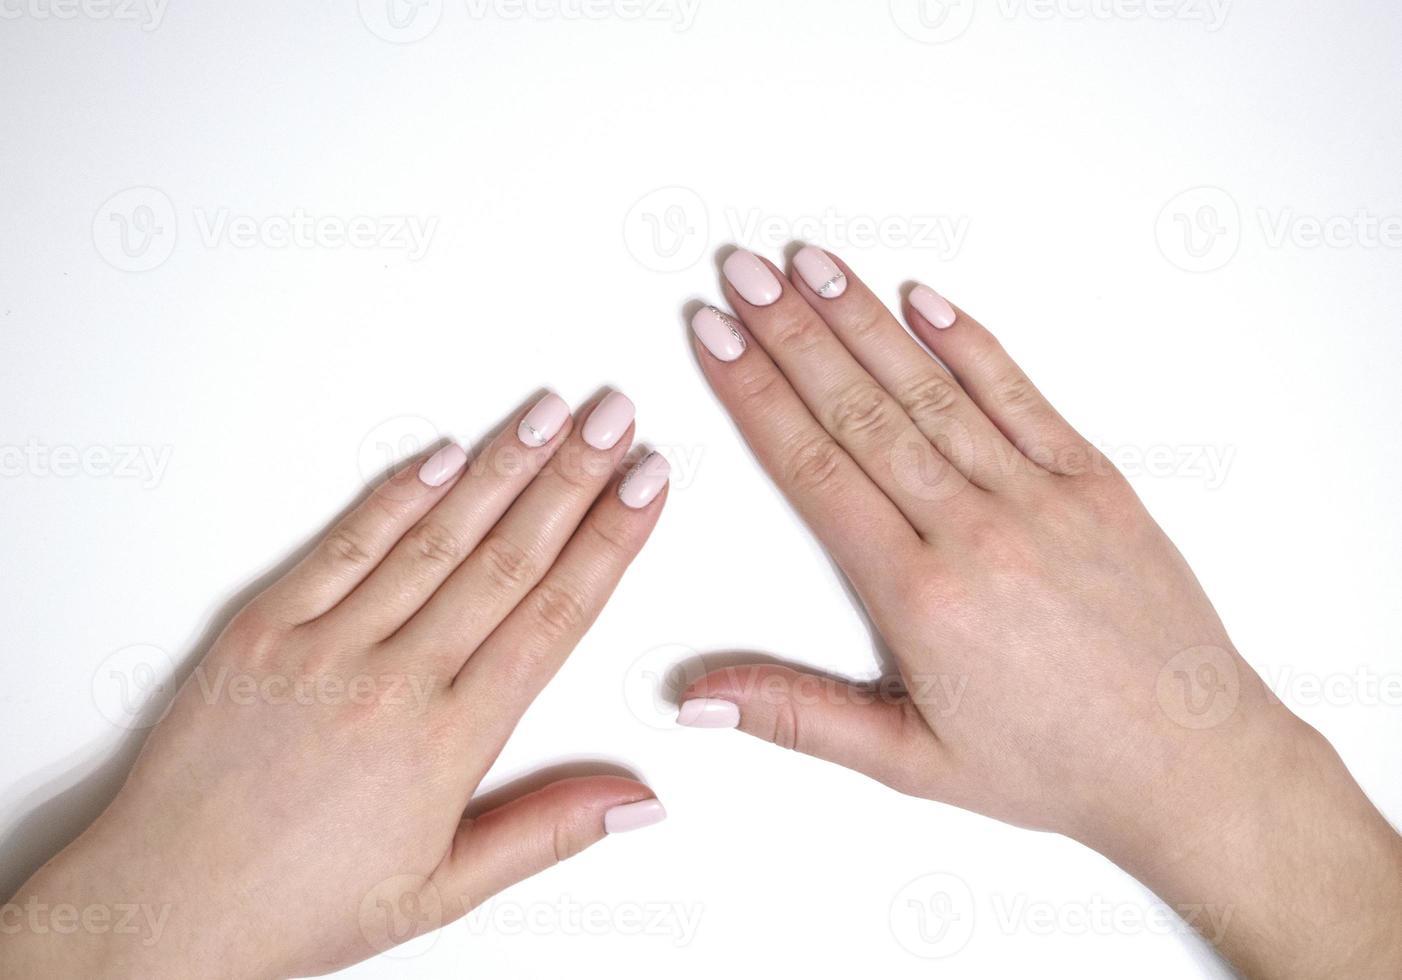 kvinnlig manikyr på en vit bakgrund. enkel foto